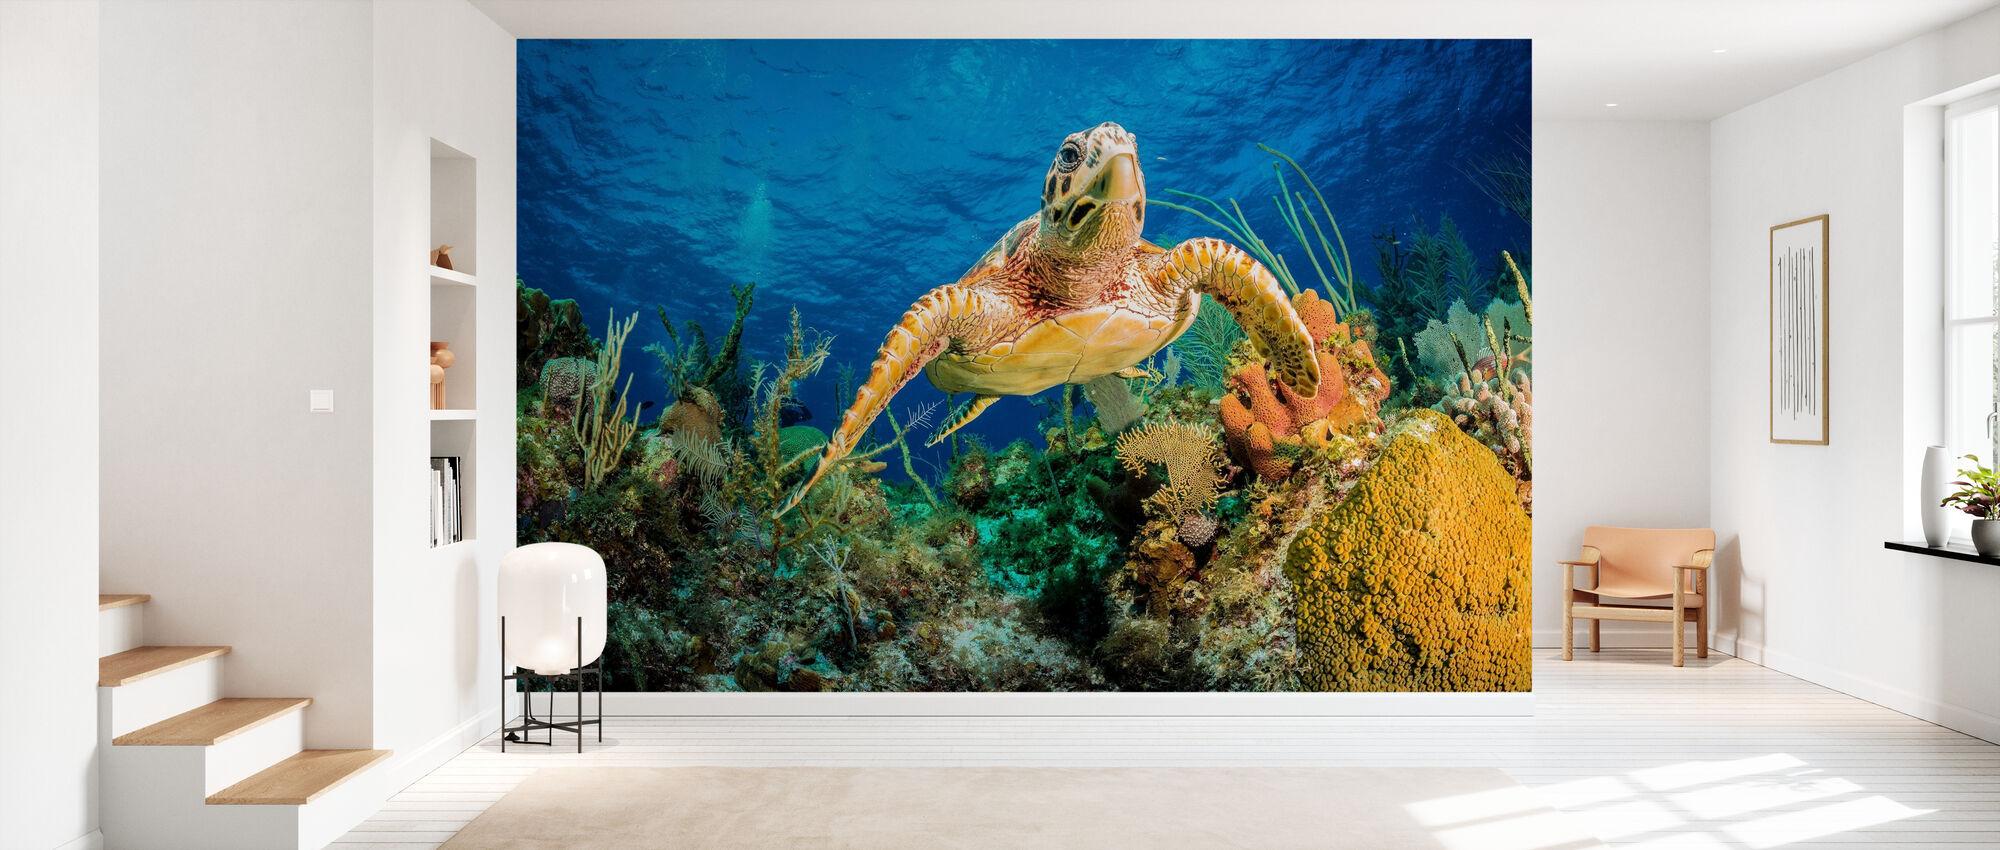 Hawksbill Turtle Swimming - Wallpaper - Hallway